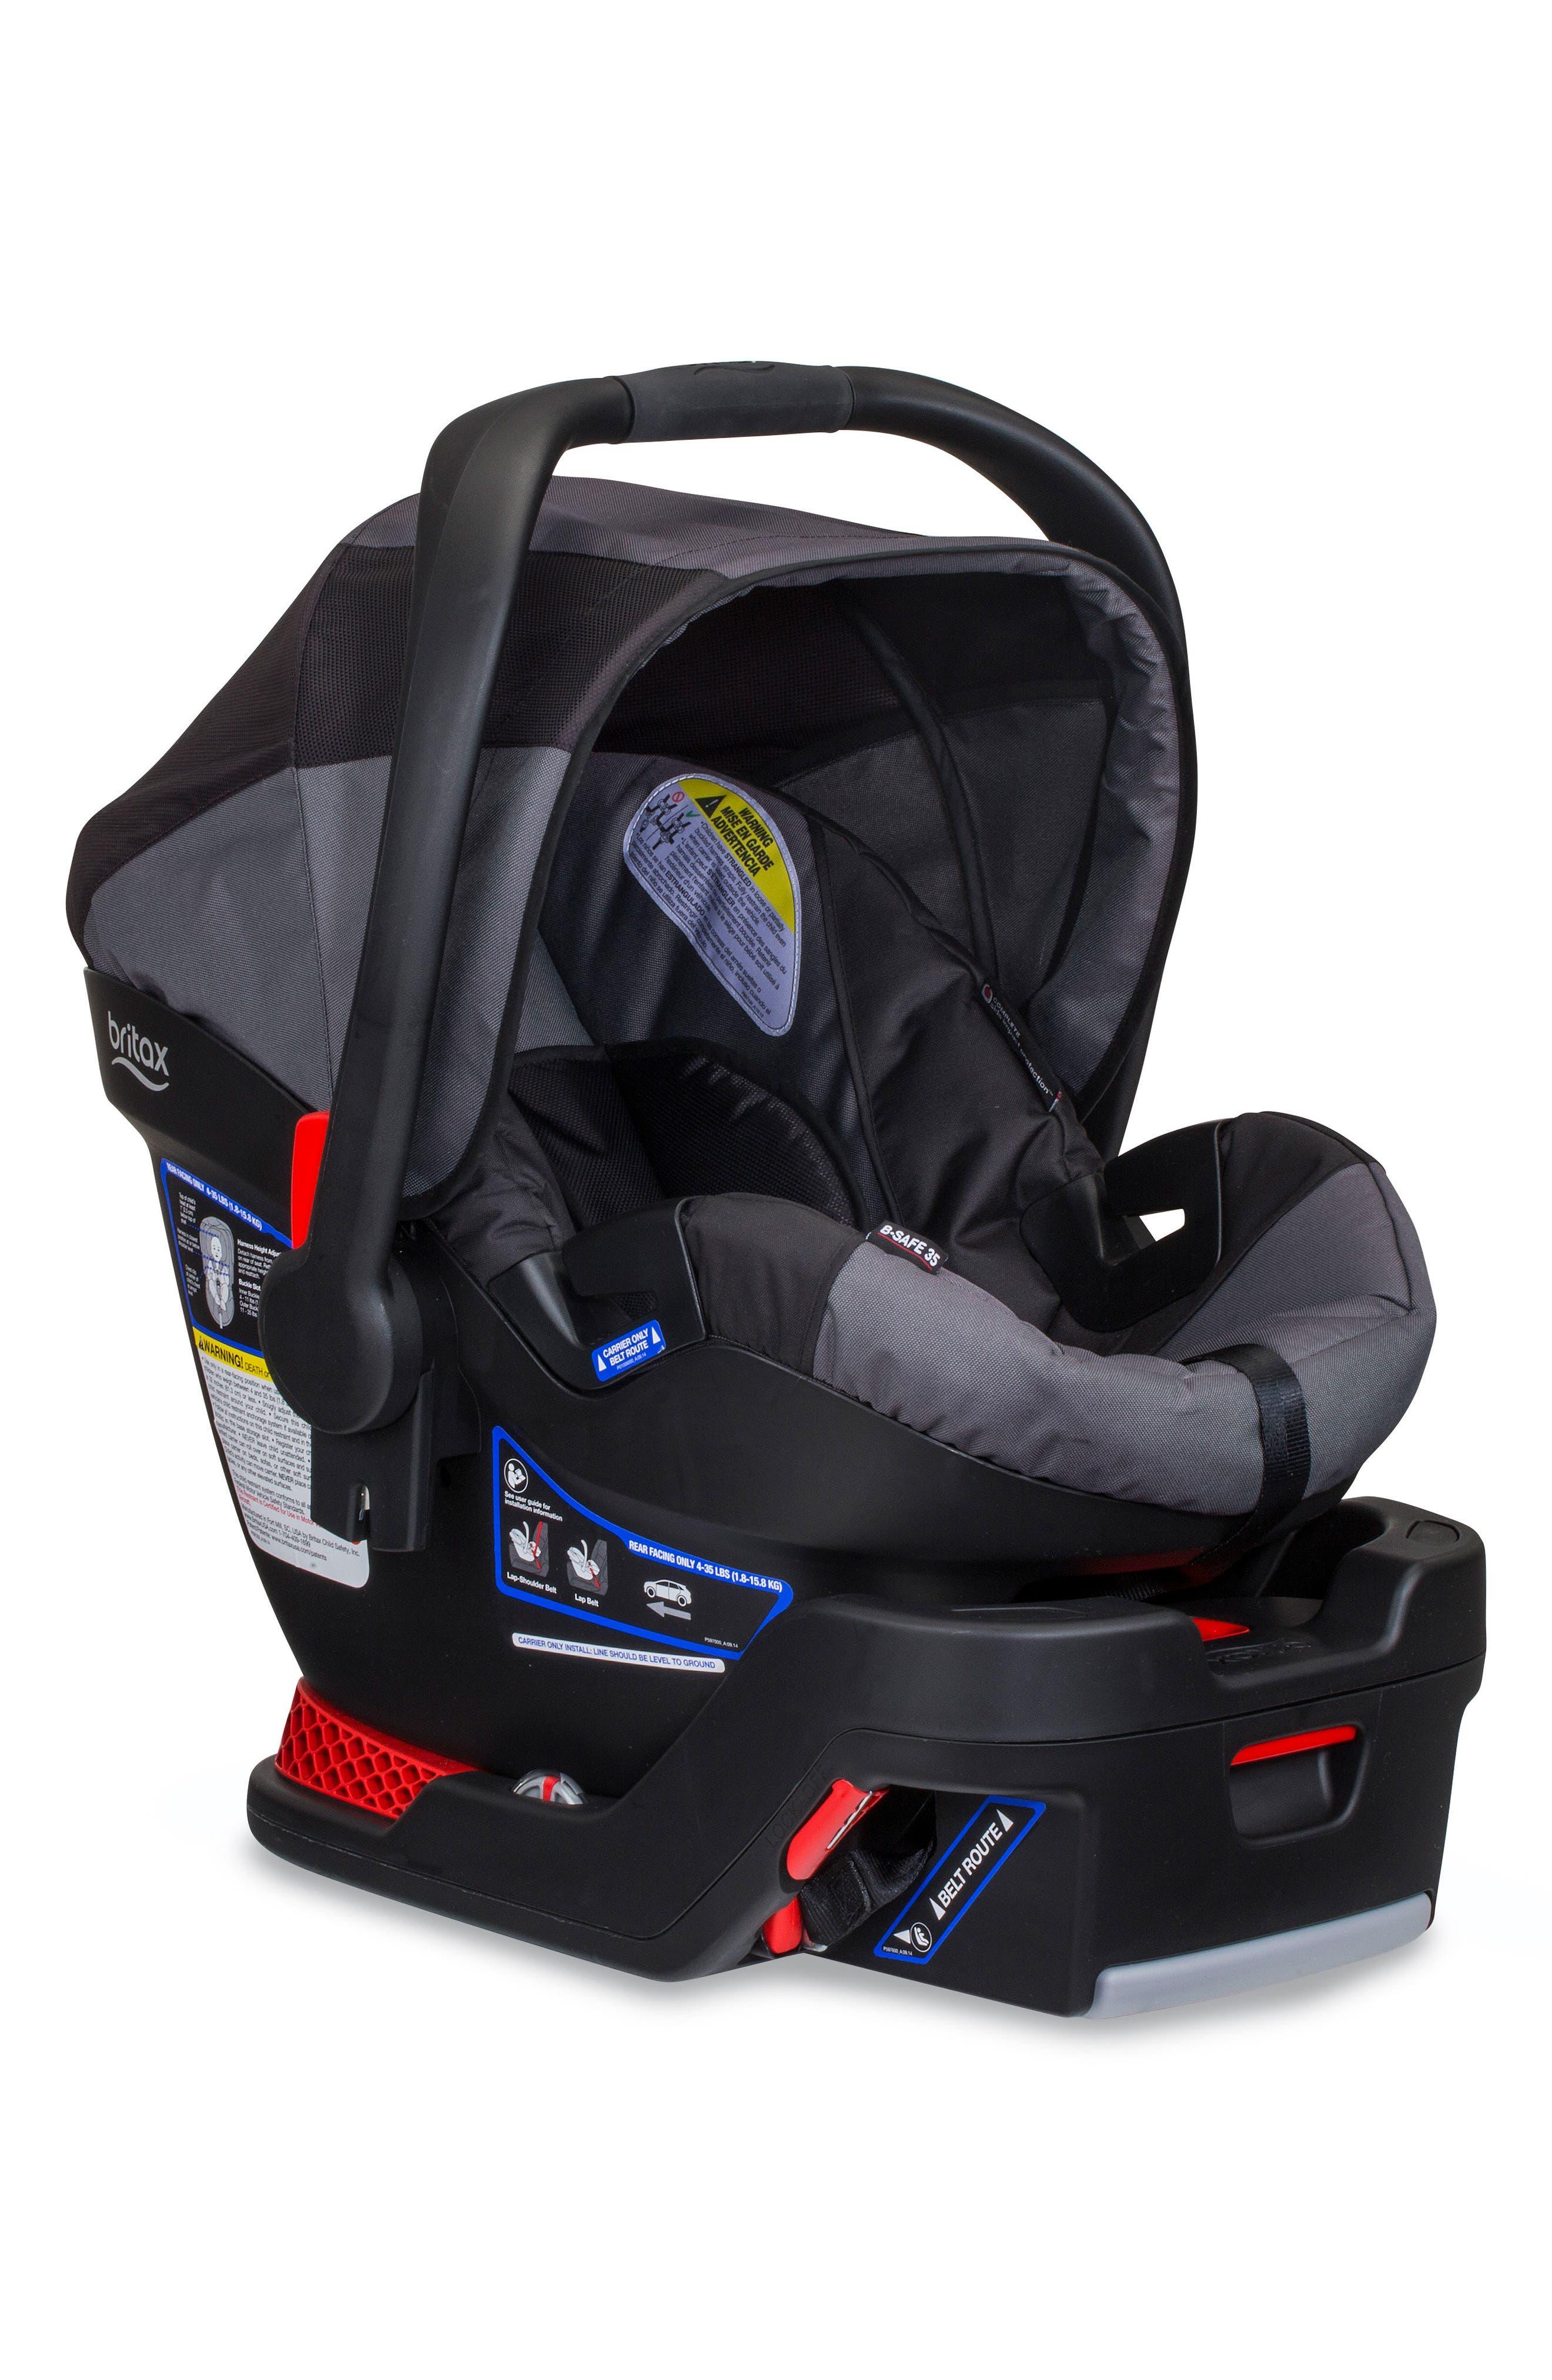 B-Safe 35 by Britax Infant Car Seat & Base,                         Main,                         color, Black